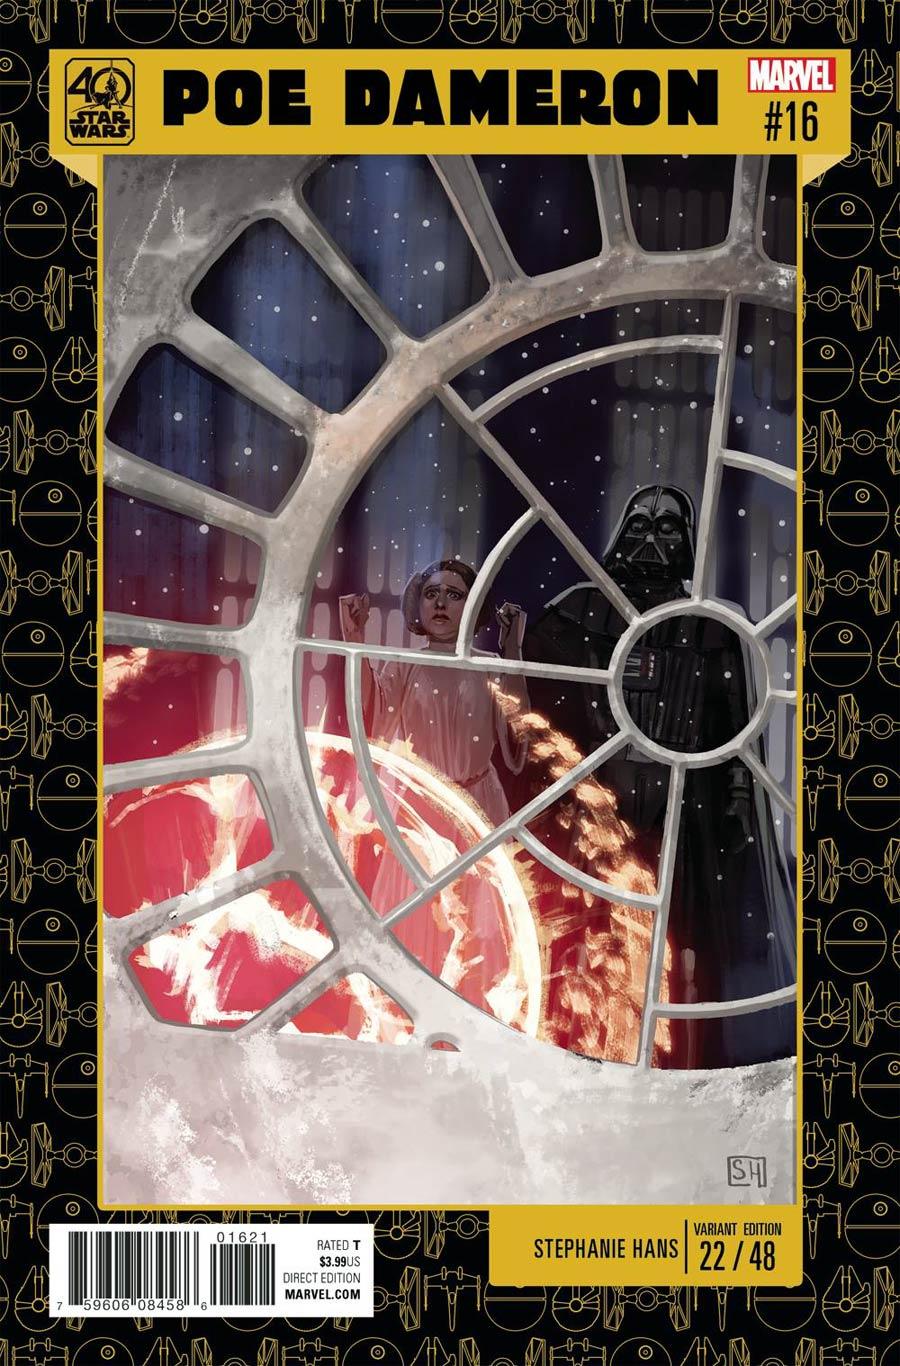 Star Wars Poe Dameron #16 Cover B Variant Stephanie Hans Star Wars 40th Anniversary Cover